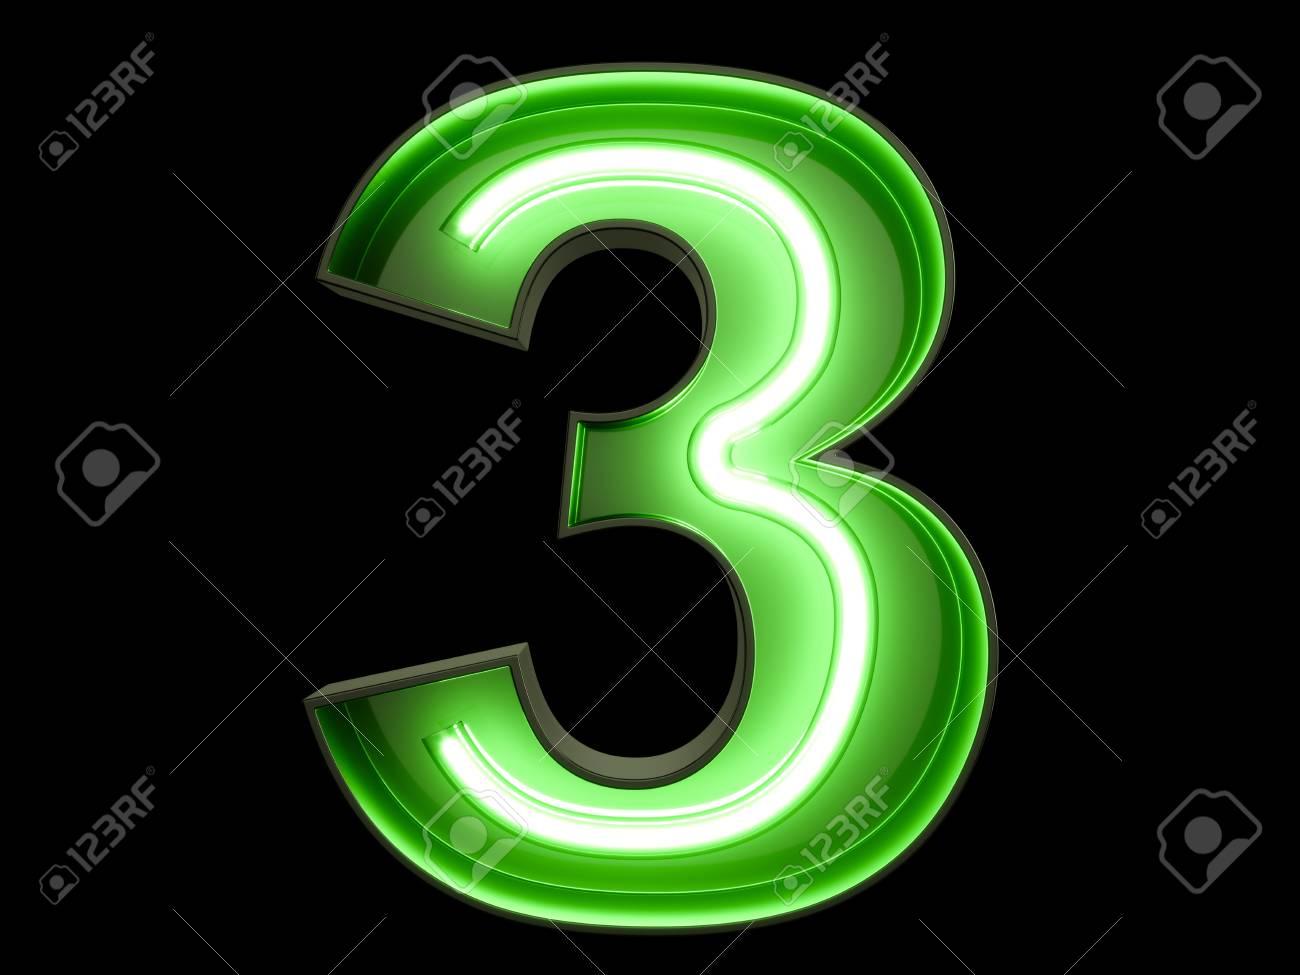 Neon Green Light Glowing Digit Alphabet Character 3 Three Font